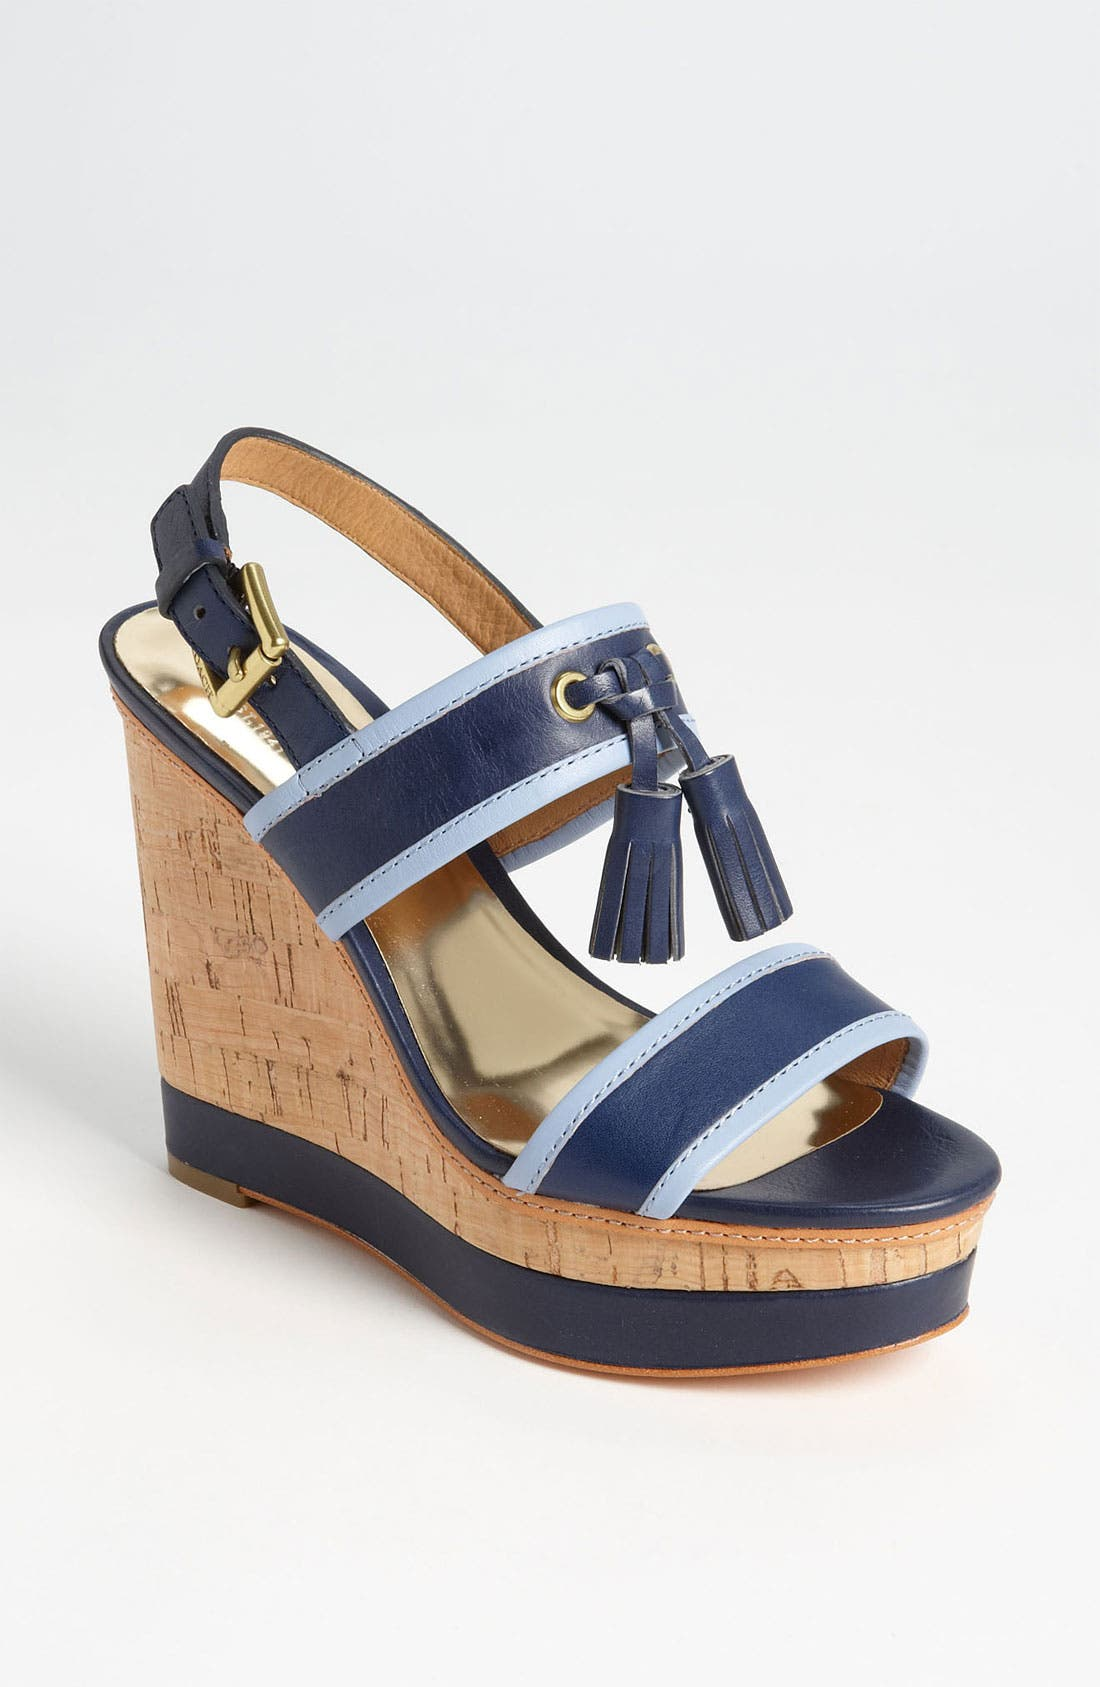 Alternate Image 1 Selected - COACH 'Guileietta' Wedge Sandal